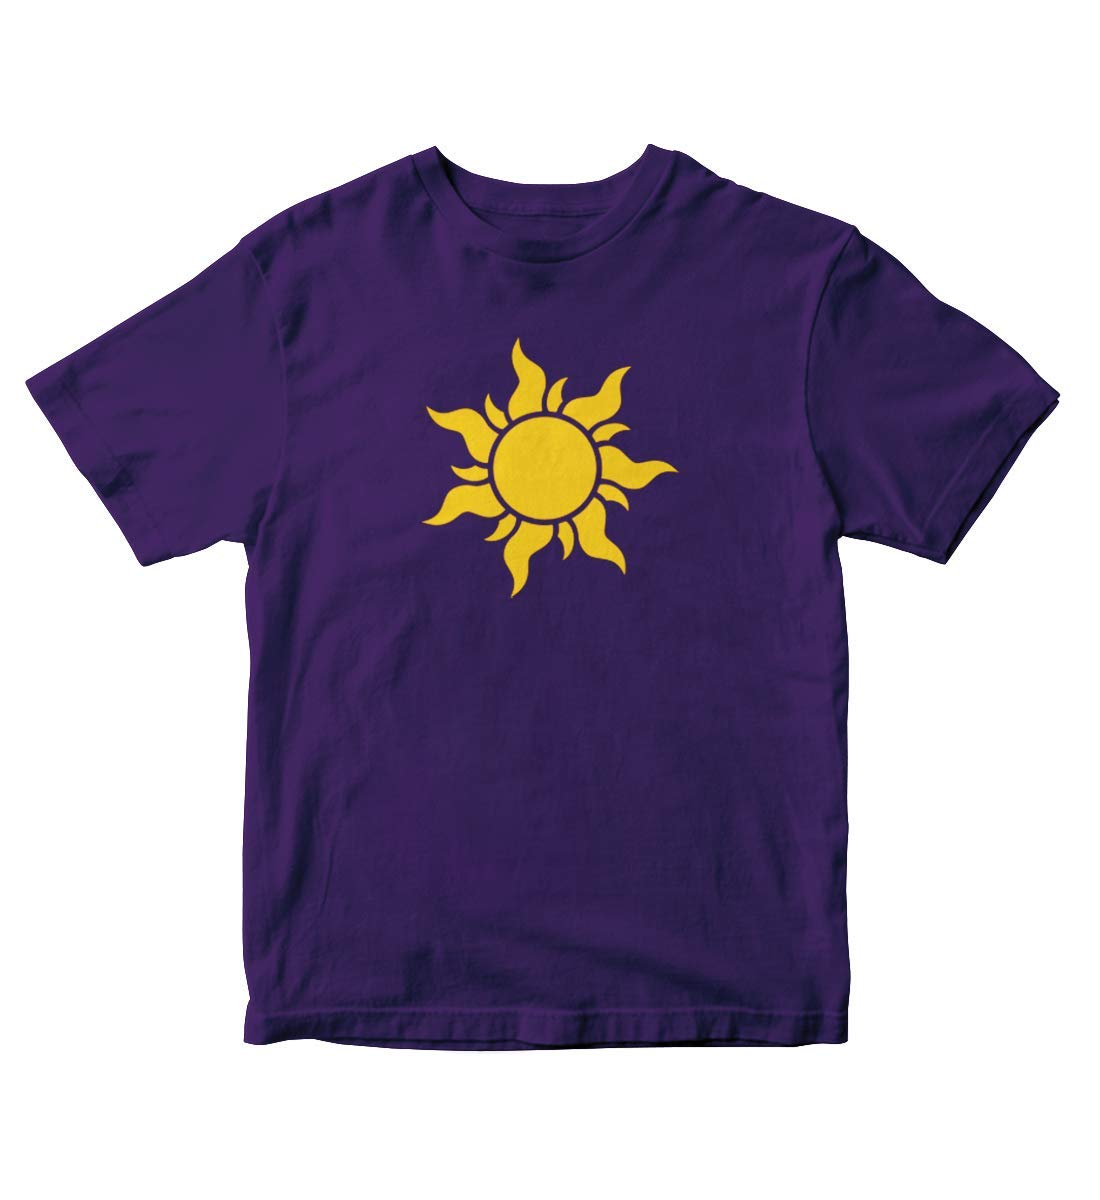 Tangled Kingdom Sun Purple Shirt S M109